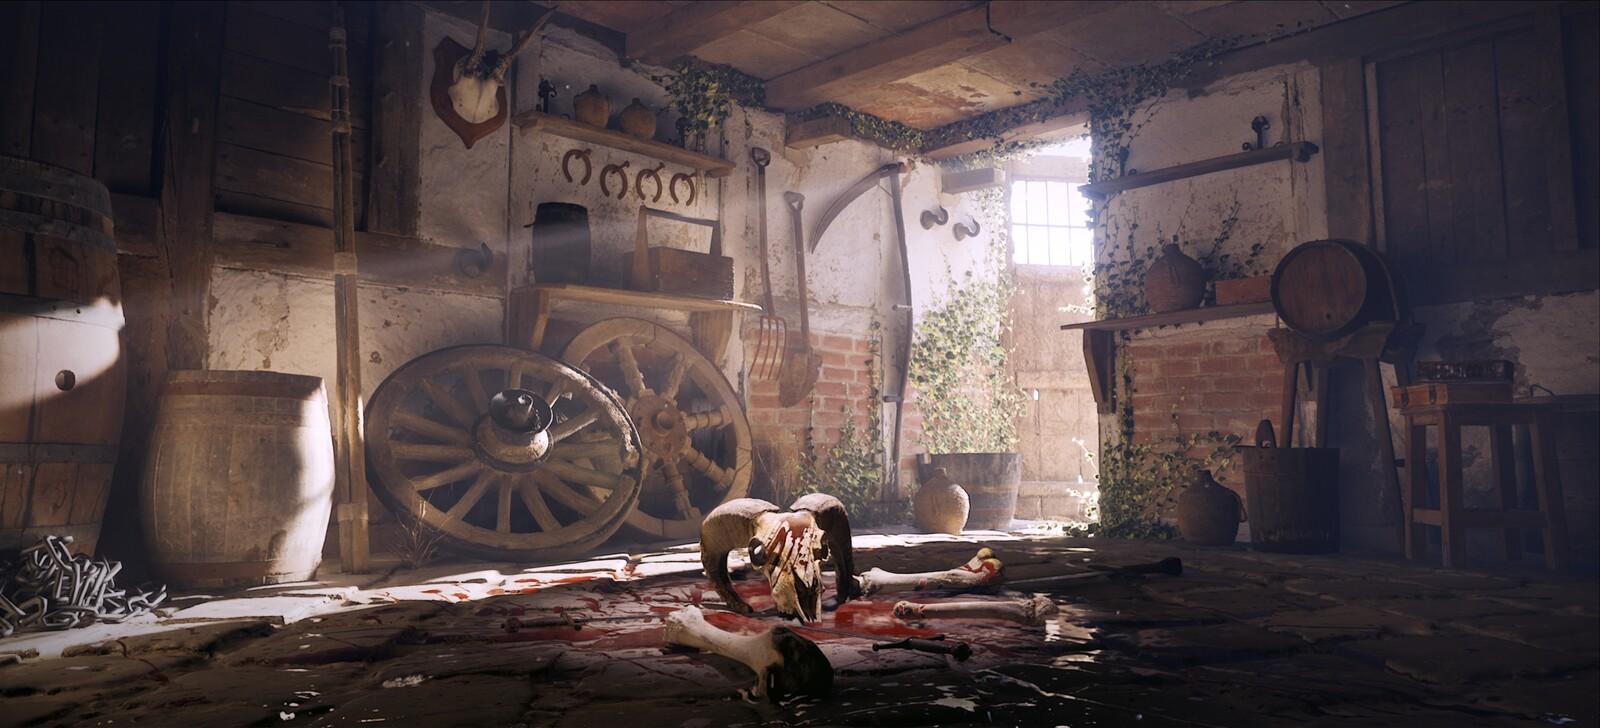 Ritual // UE5 // Megascans // Unreal Engine Animation // Lumen & Nanite